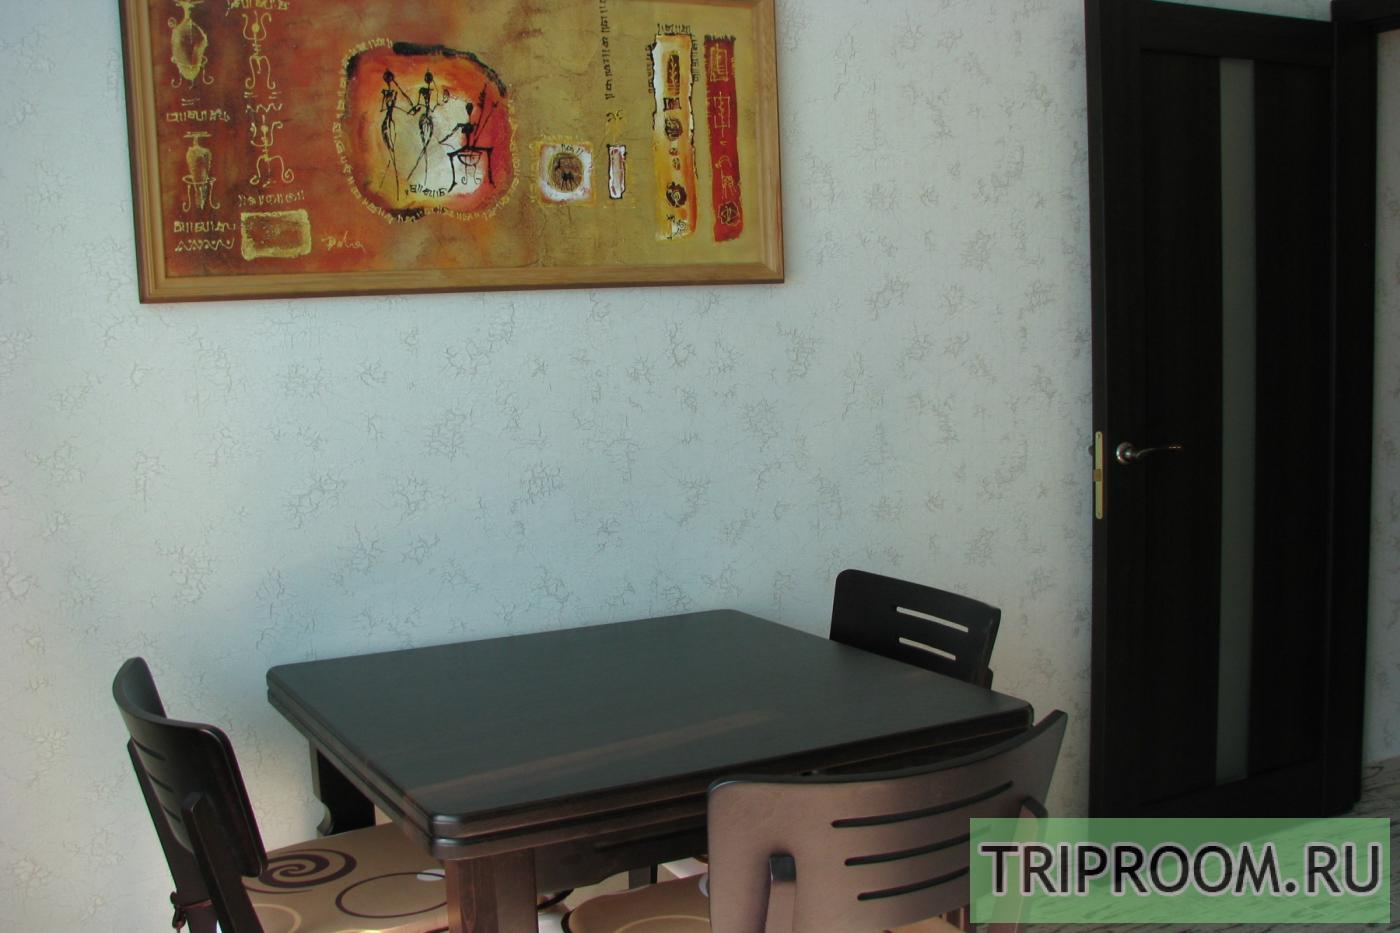 1-комнатная квартира посуточно (вариант № 34740), ул. Репина улица, фото № 4